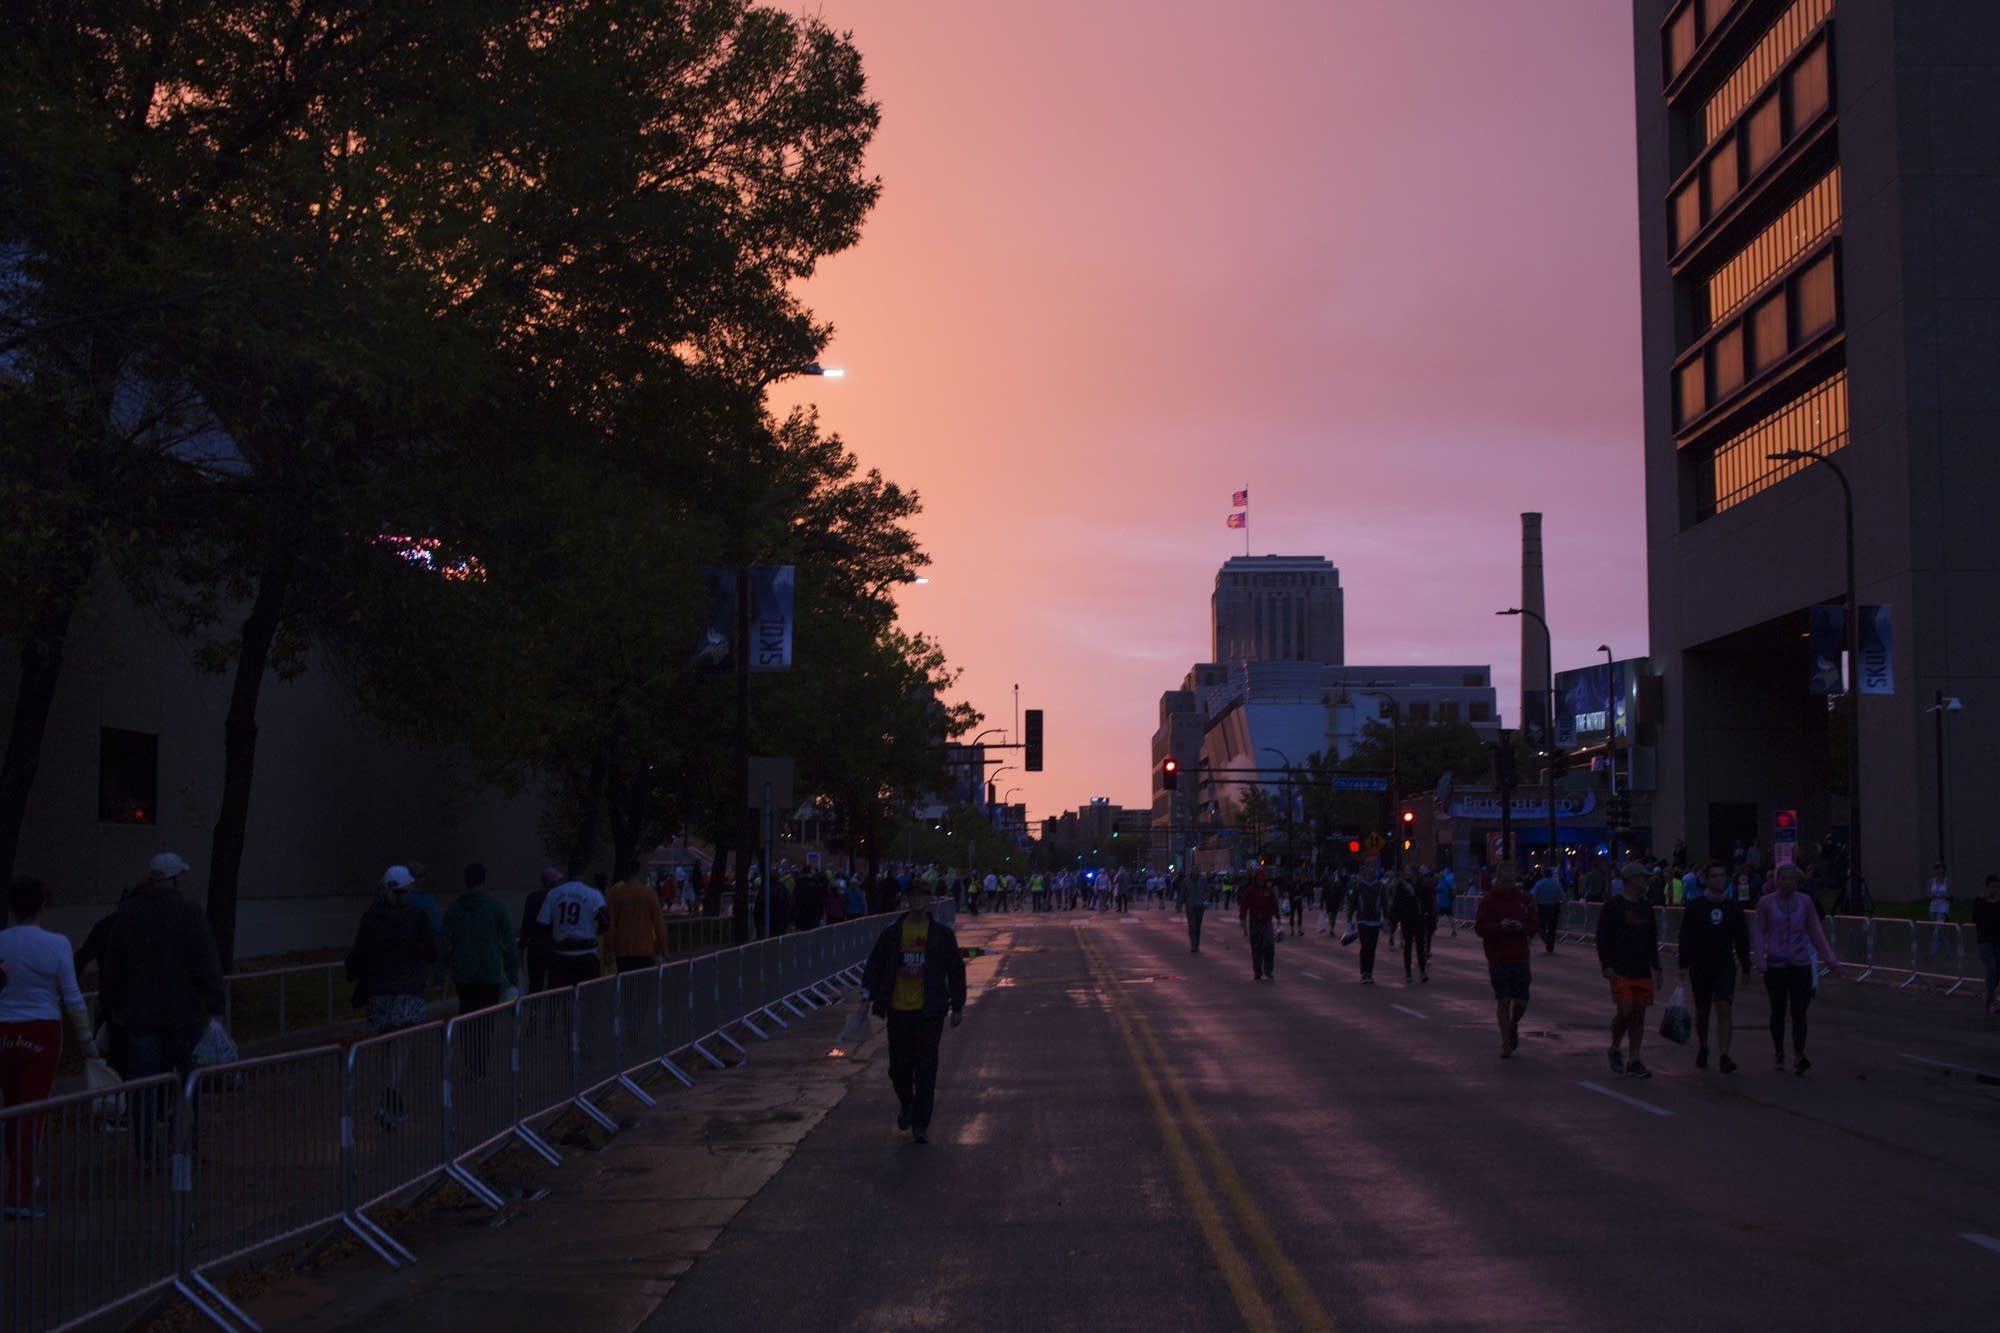 The sun rises before the marathon.